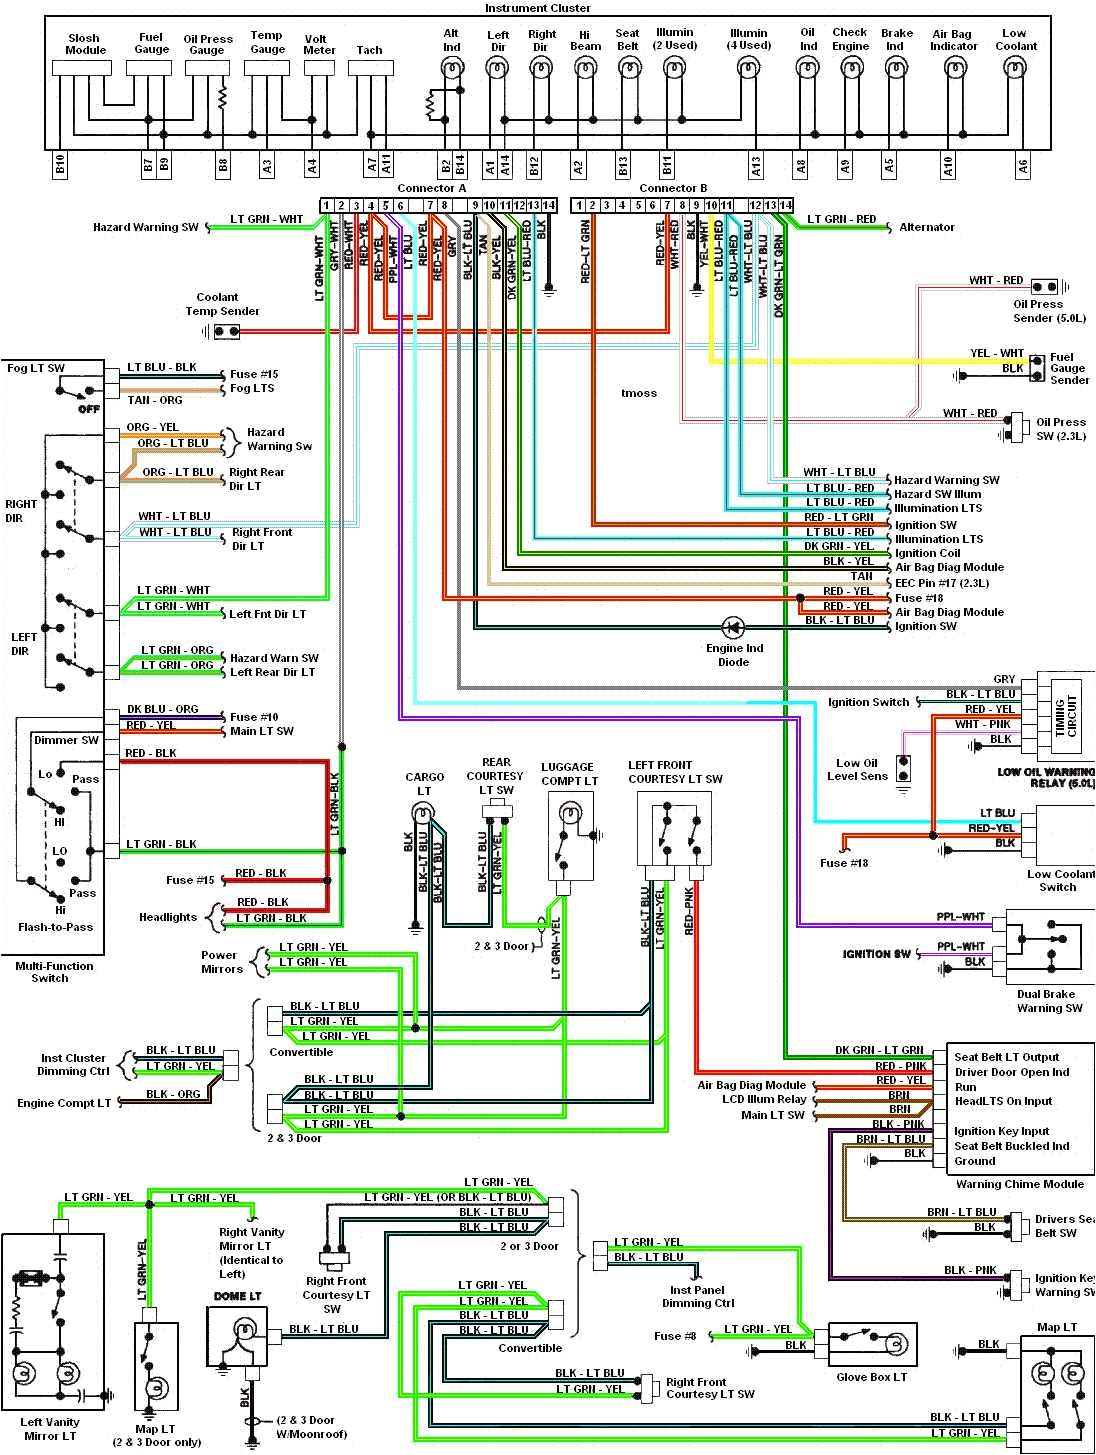 1976 mustang wiring diagram wiring diagram toolbox 1976 mustang dash wiring diagram